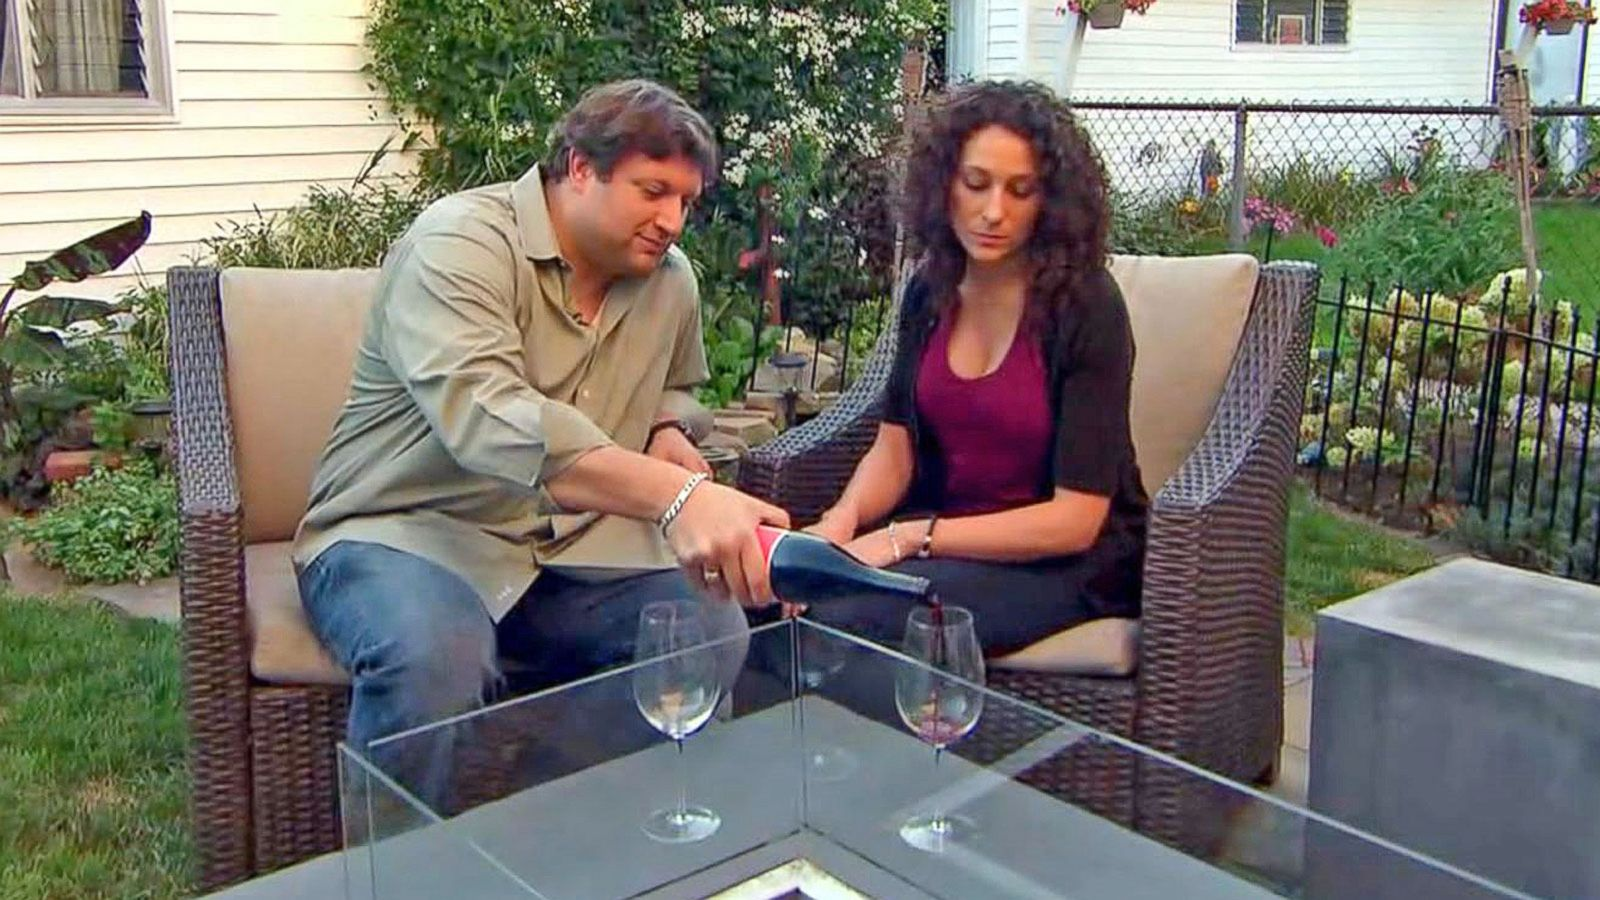 VIDEO: Basement Bar Remodel Causes Couple a Headache